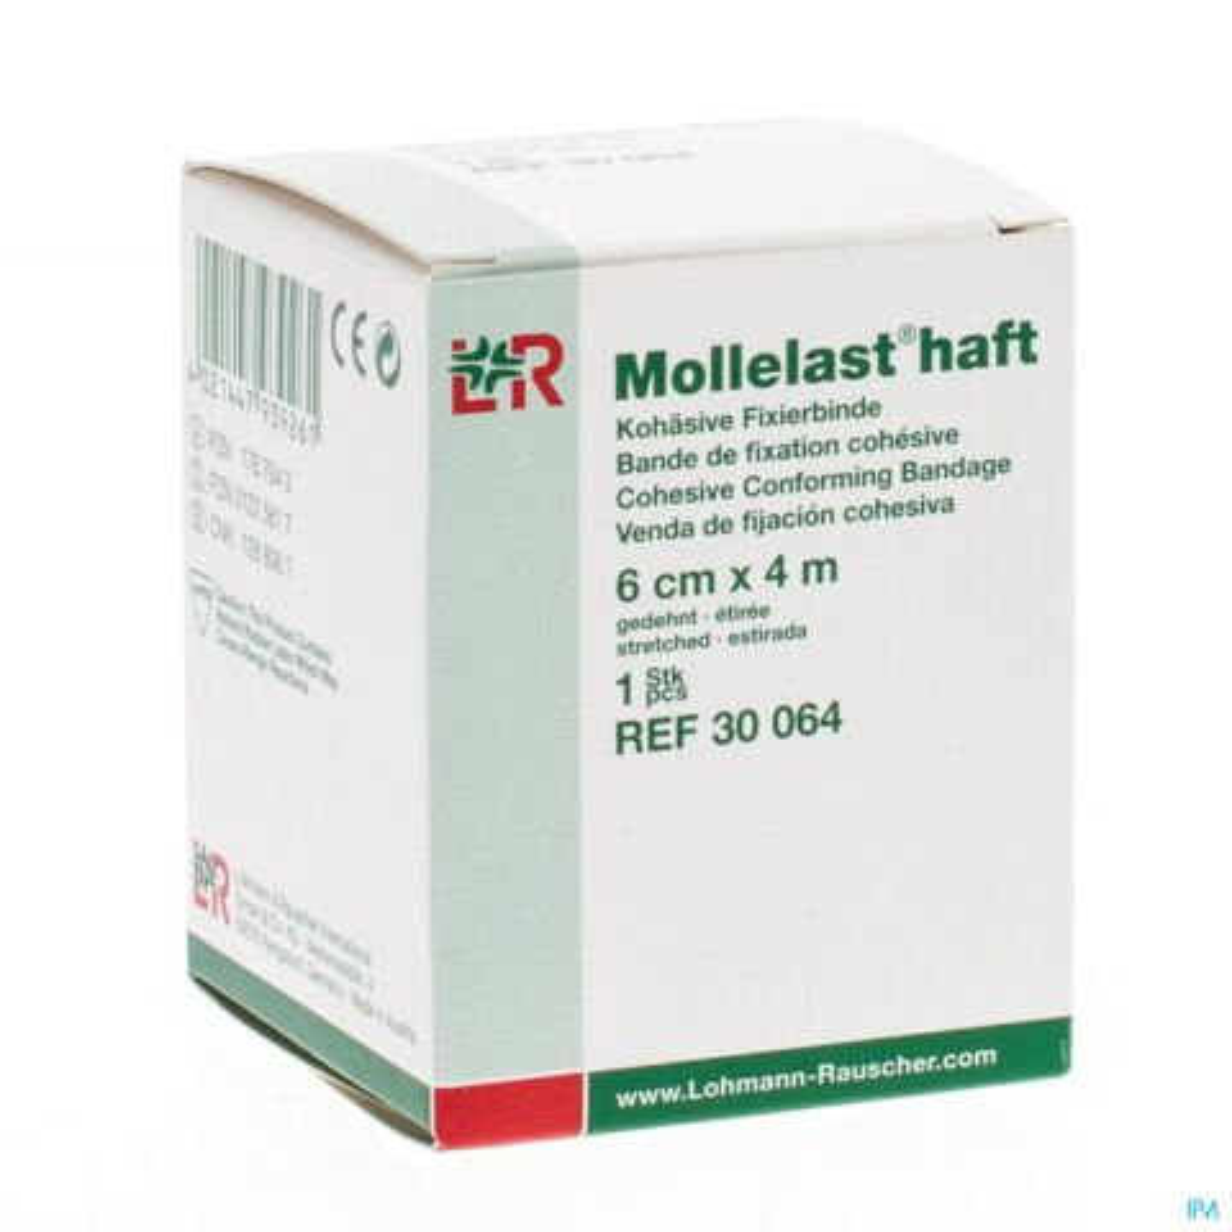 MOLLELAST HAFT BANDE ELAST ADH 6CMX 4M 30064